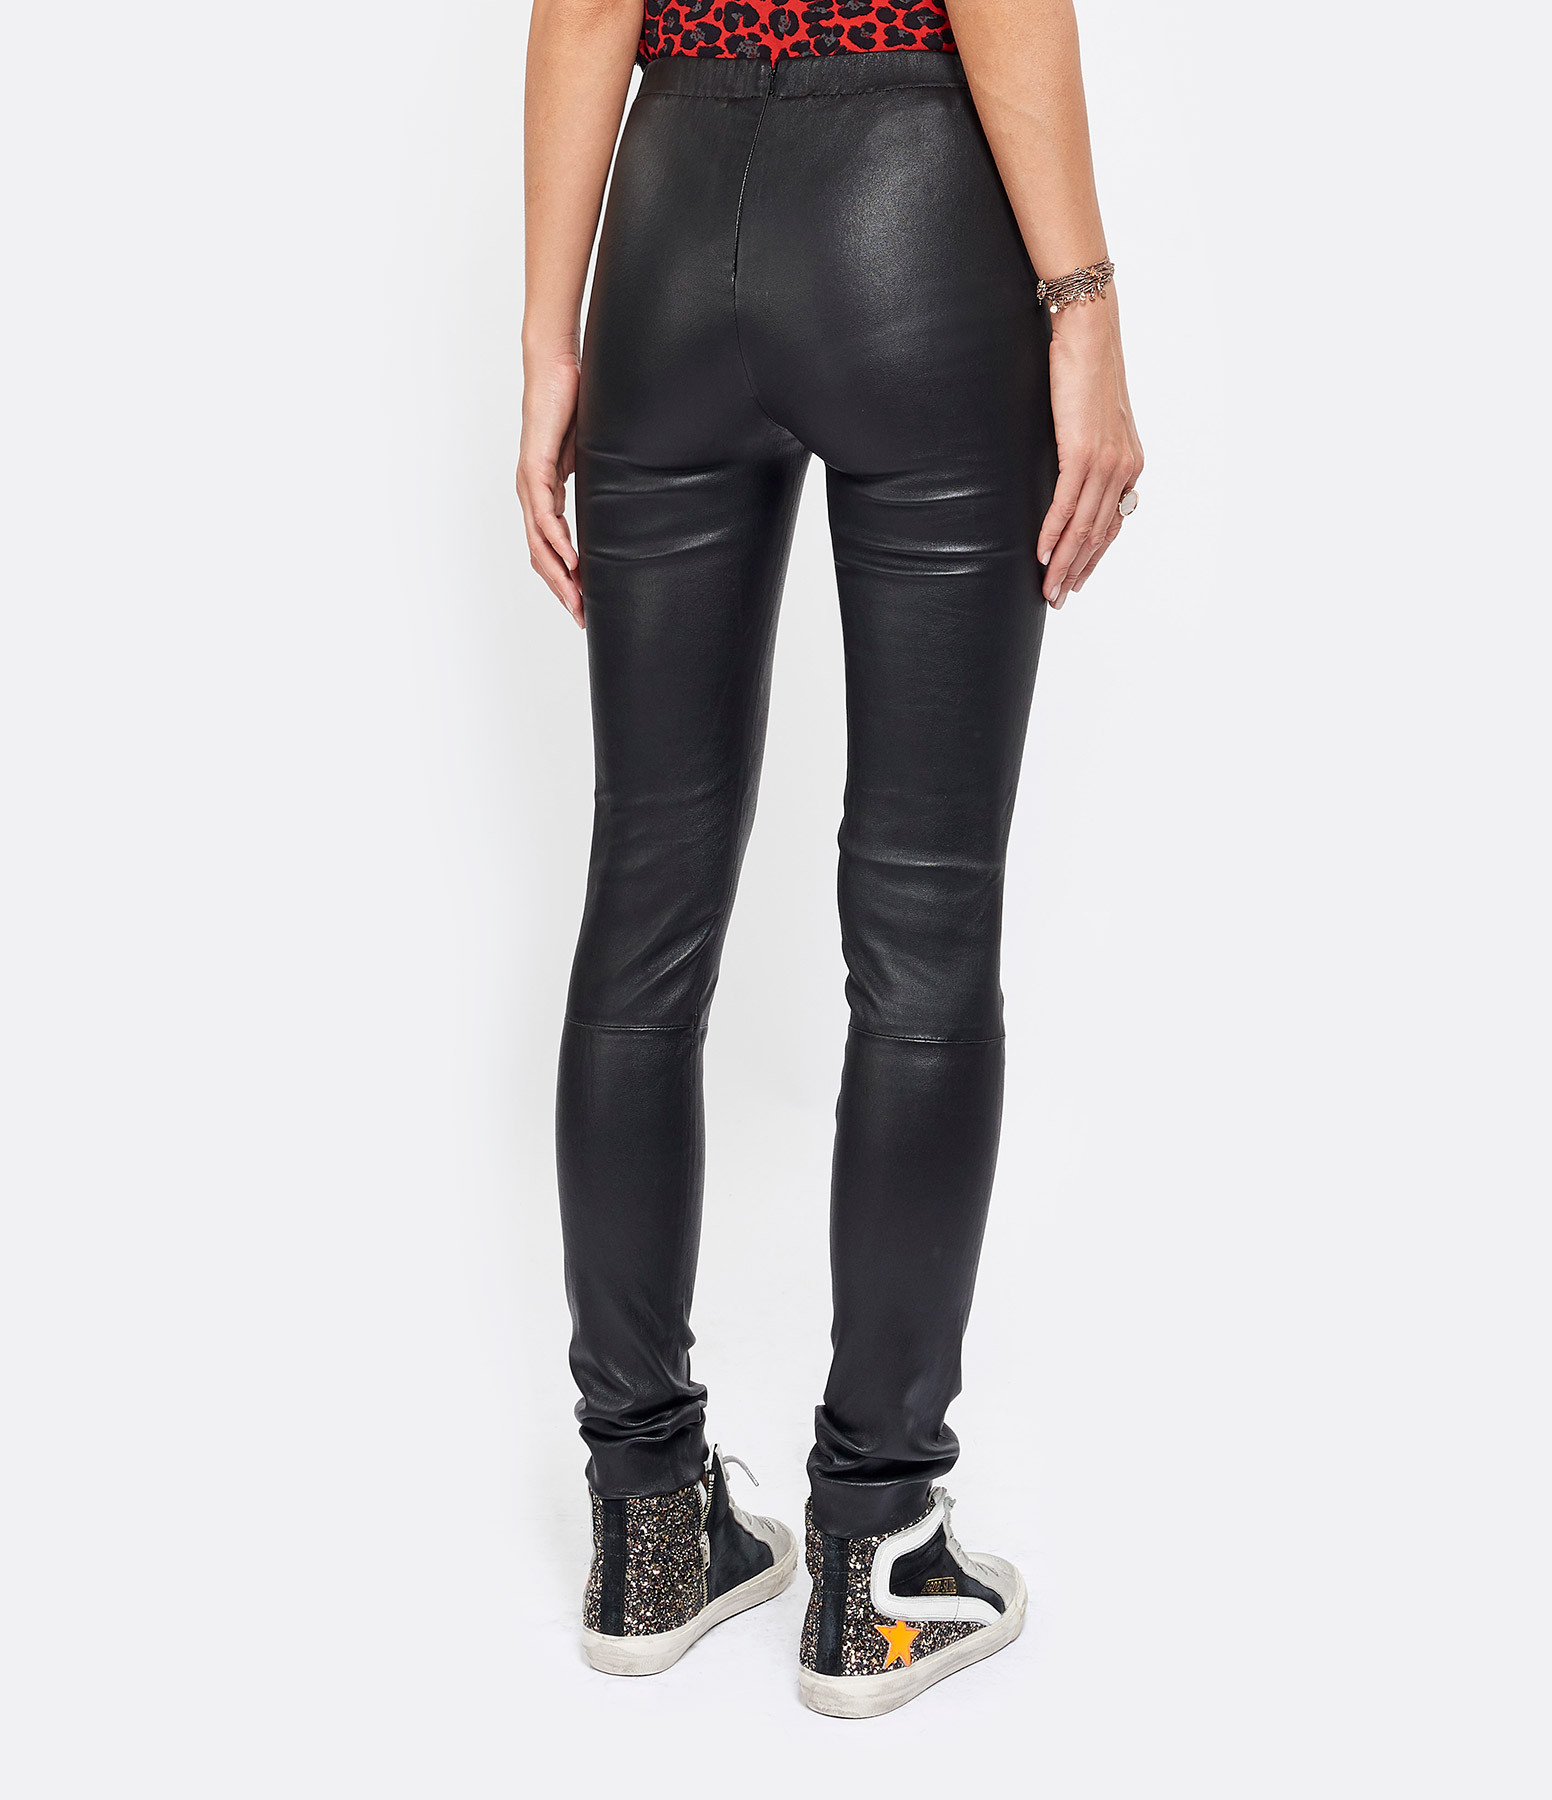 ZADIG & VOLTAIRE - Pantalon Pharel Cuir Noir